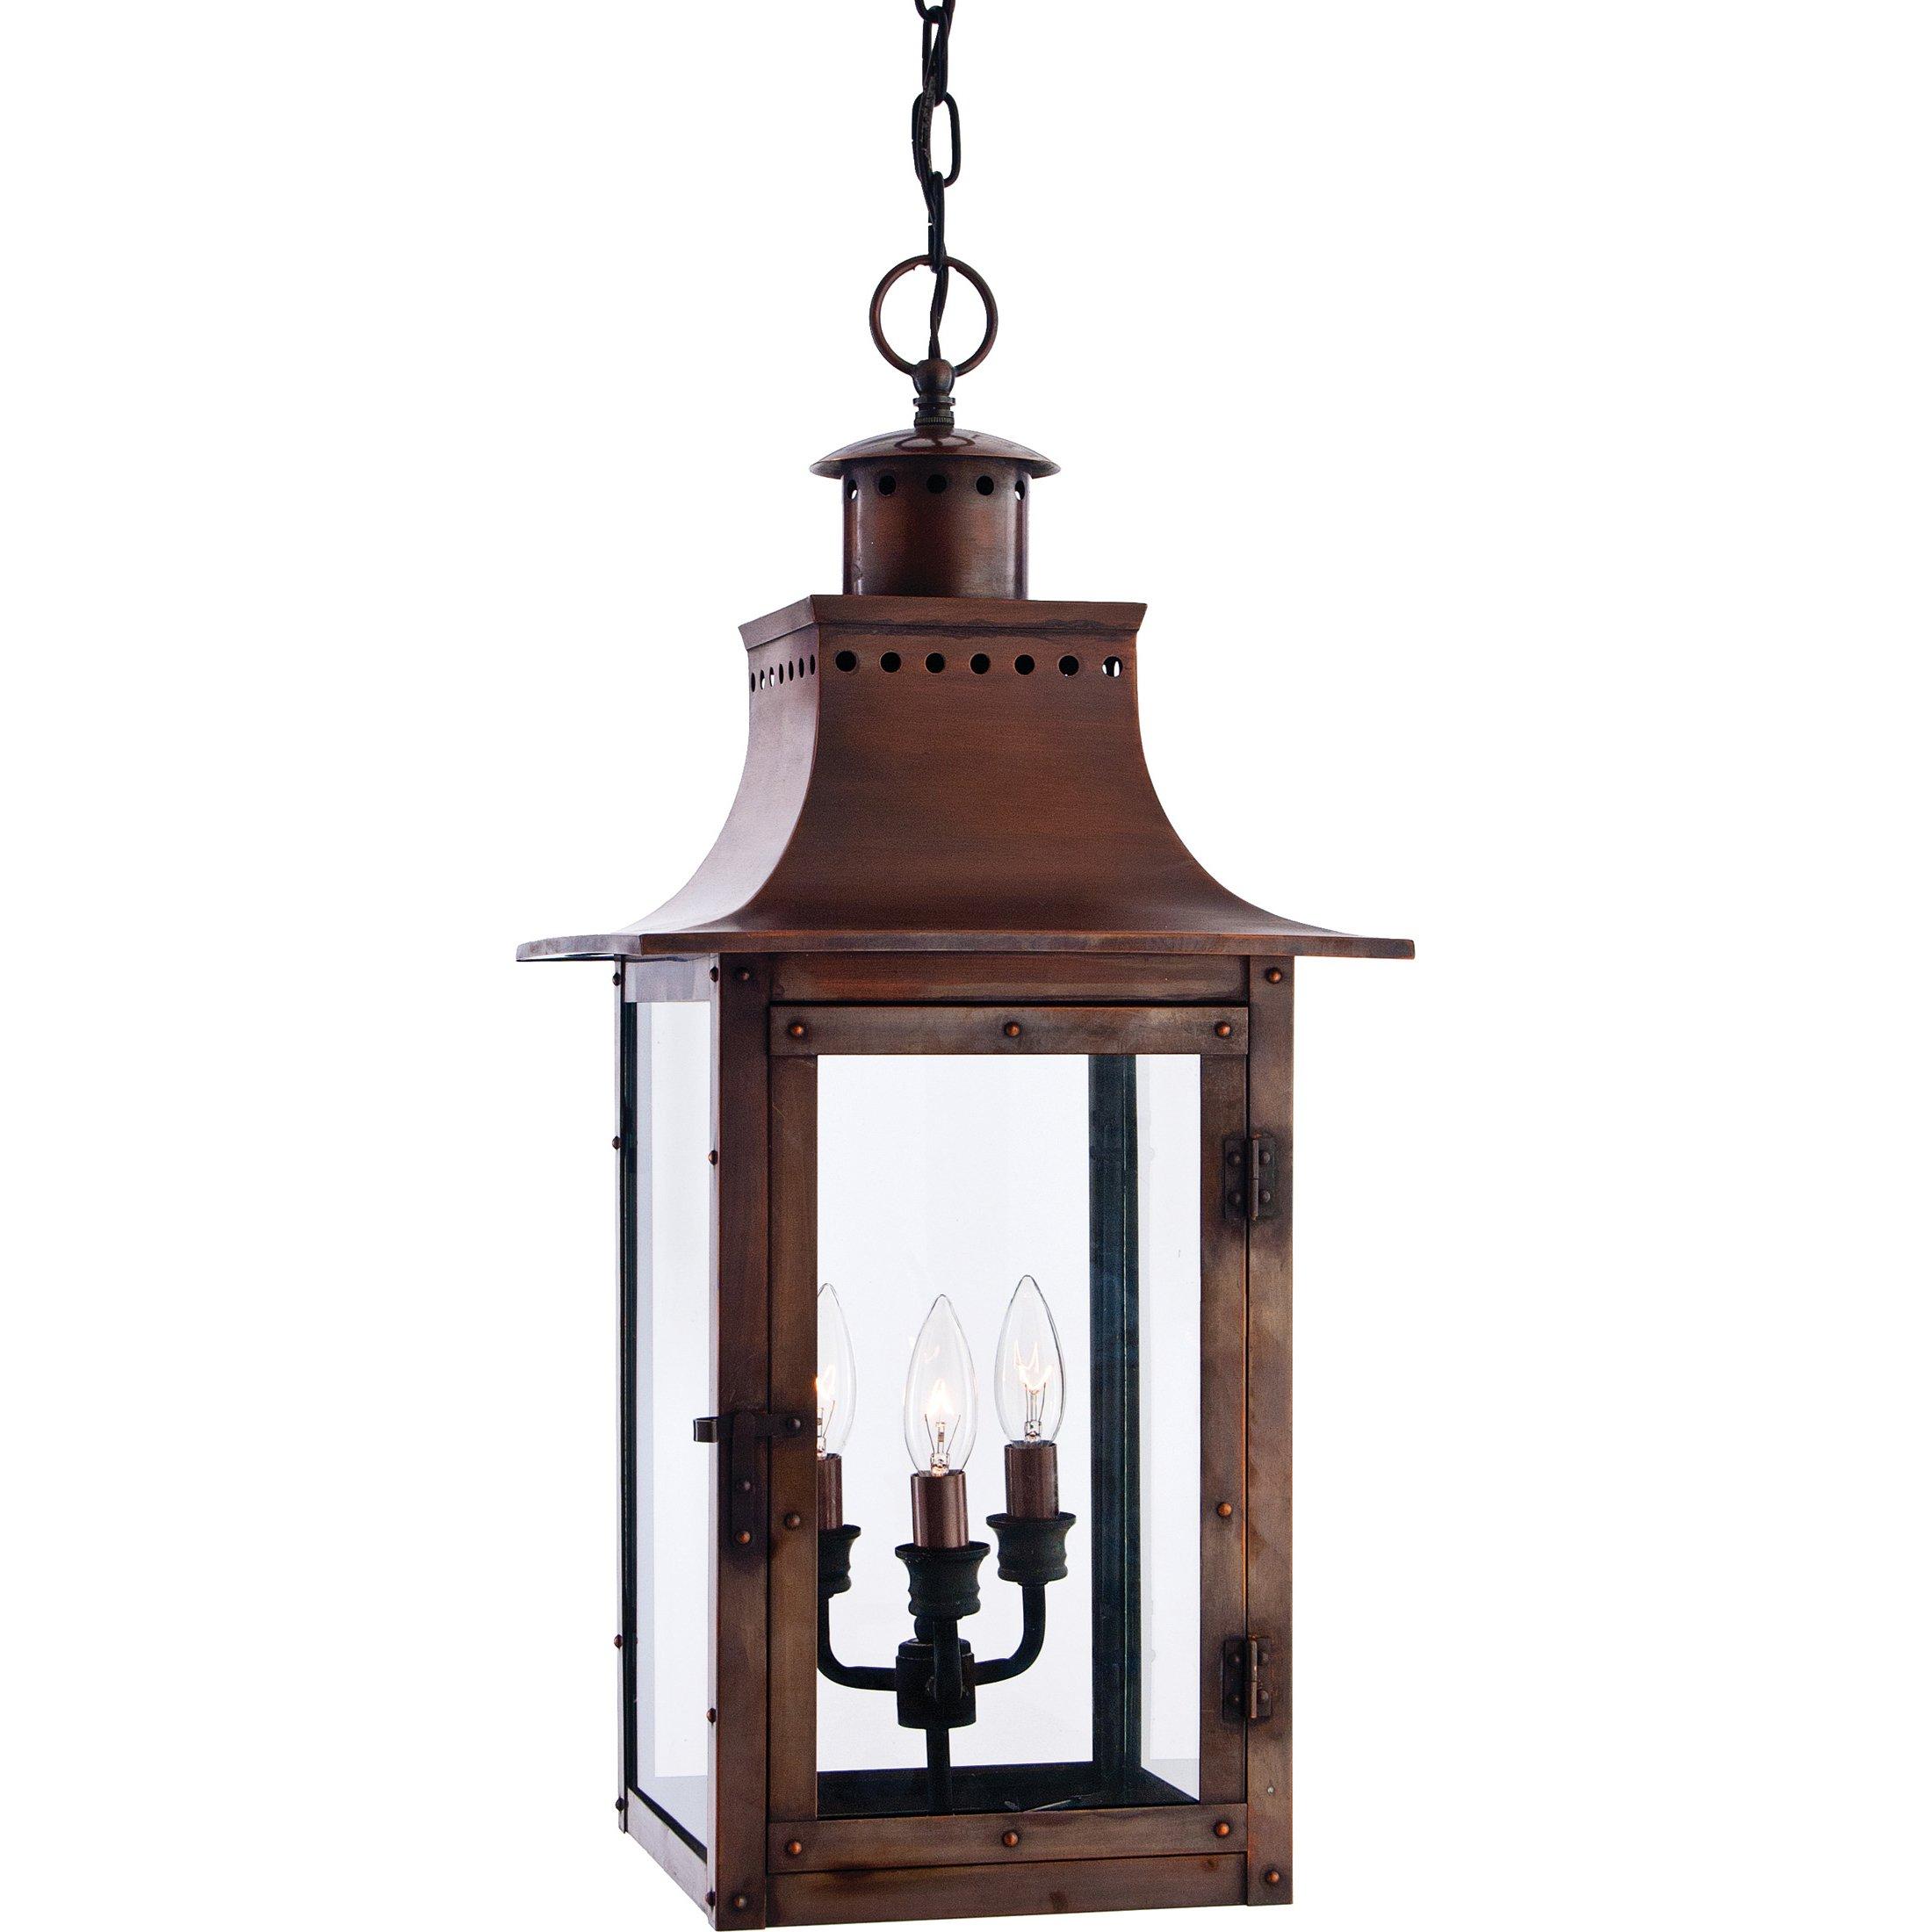 Quoizel CM1912AC Chalmers 26-Inch Jumbo Hanging Lantern, Aged Copper Finish